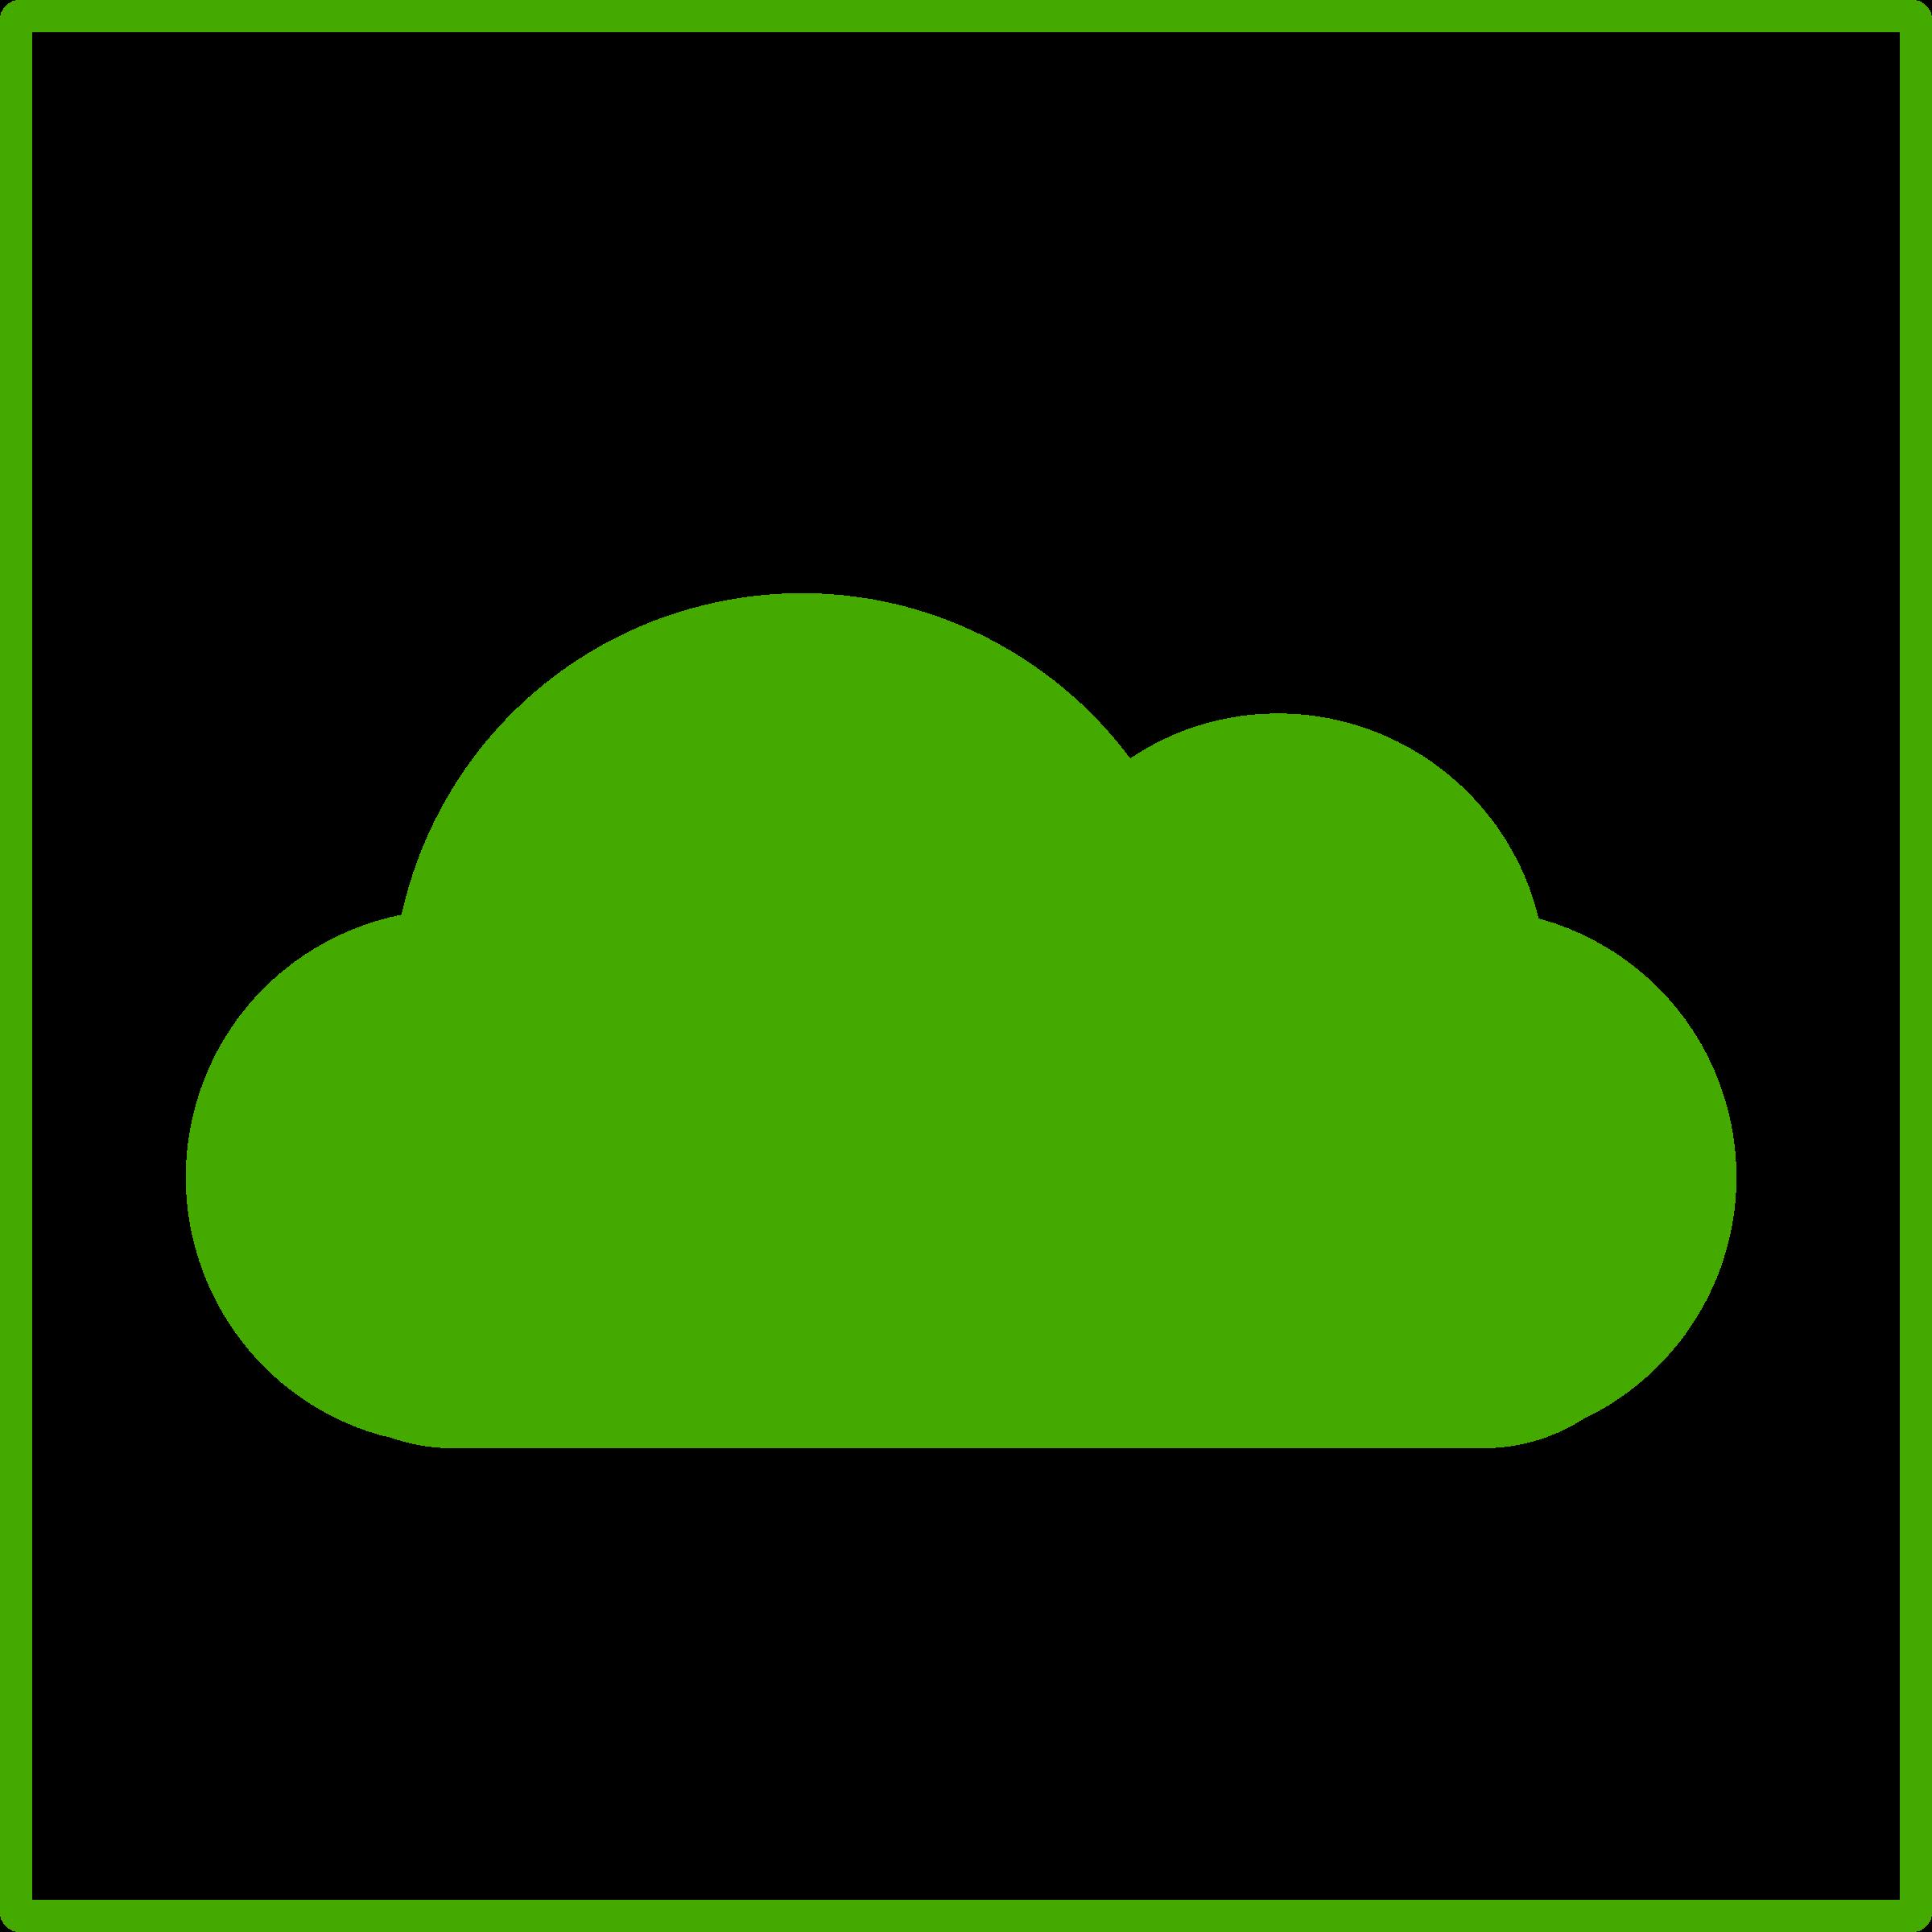 Lime green sun clipart svg transparent green cloud - Tier.brianhenry.co svg transparent